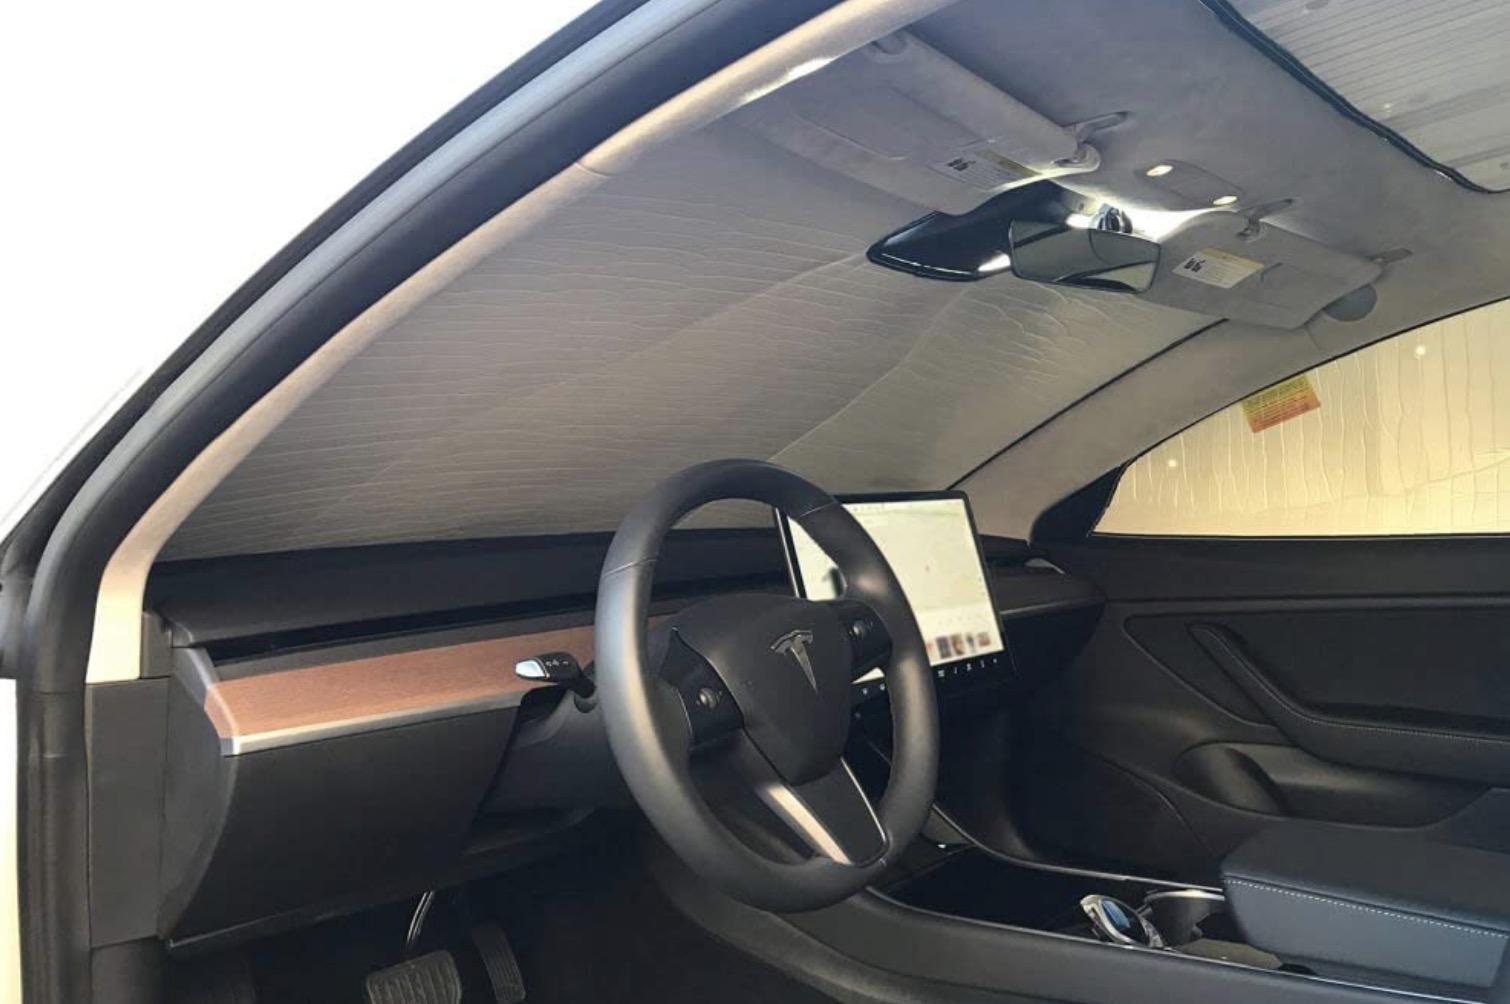 10 Must-Have Tesla Model 3 Accessories